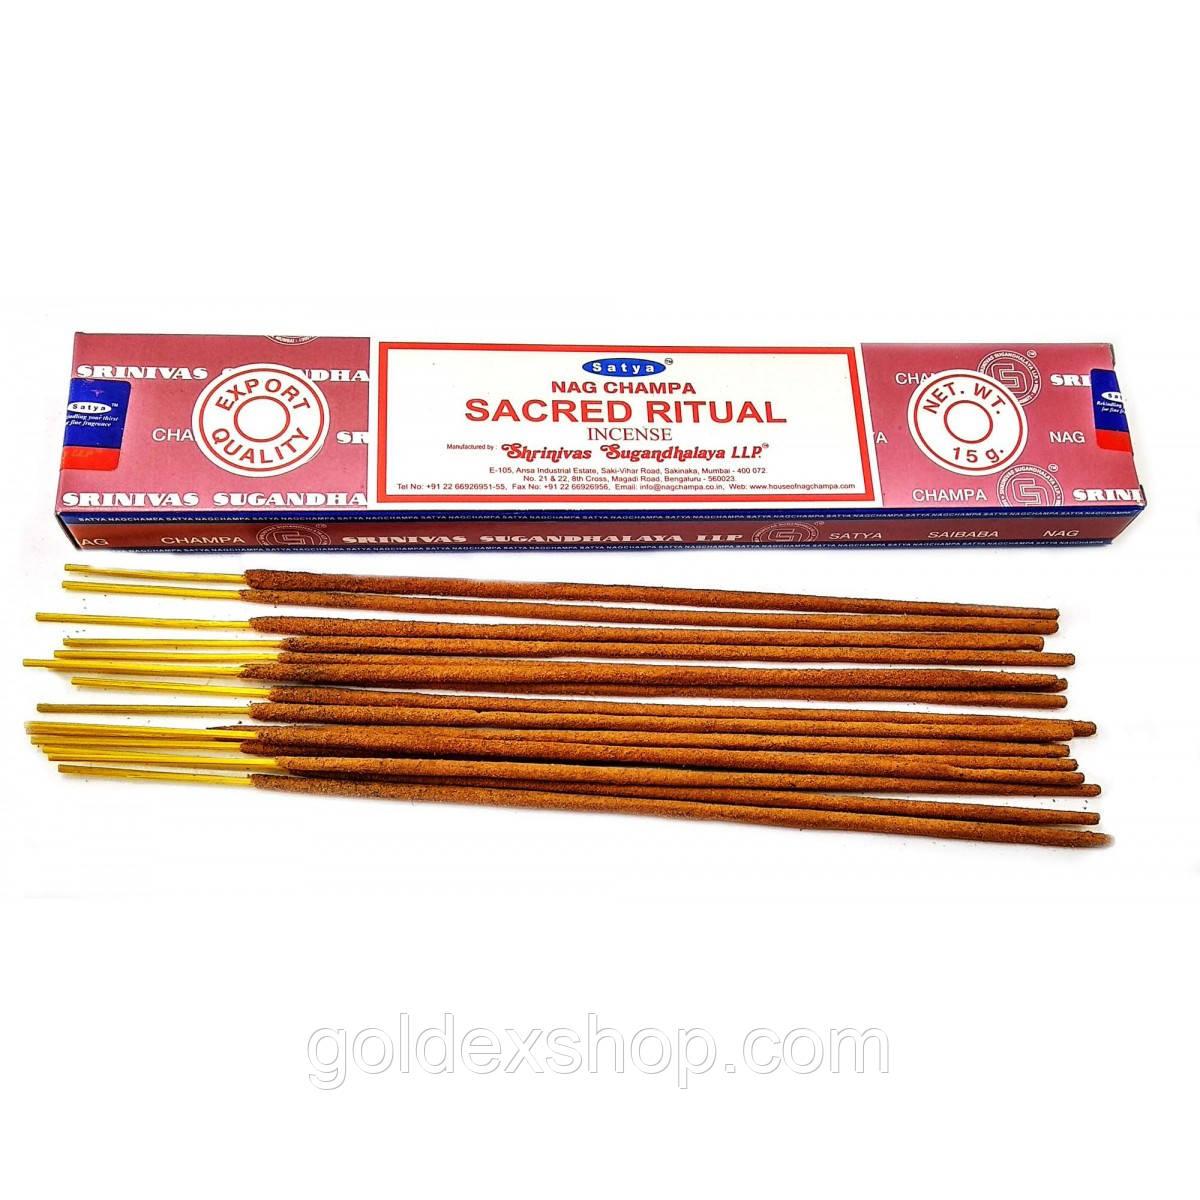 Аромапалочки Sacred Ritual (Священный Ритуал)(15 грамм) (Satya) Масала благовоние